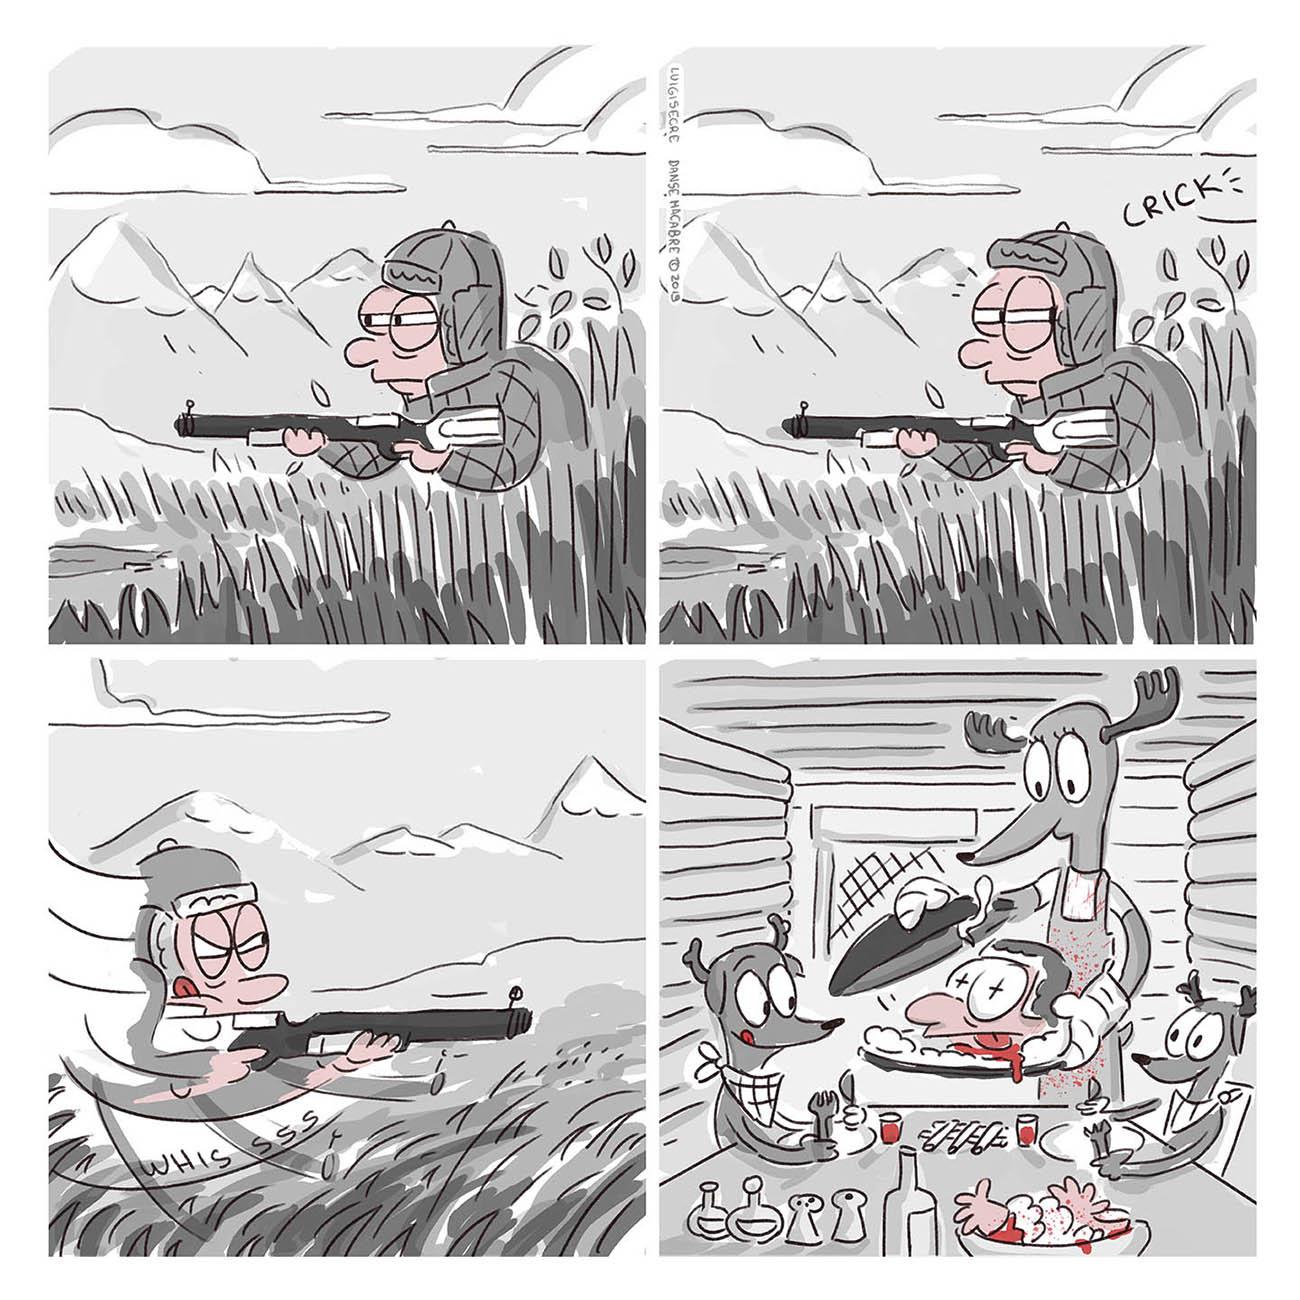 Contenuti_Low_Res_Luigi_Segre_Cartoons_2019_Danse_Macabre_03.jpg